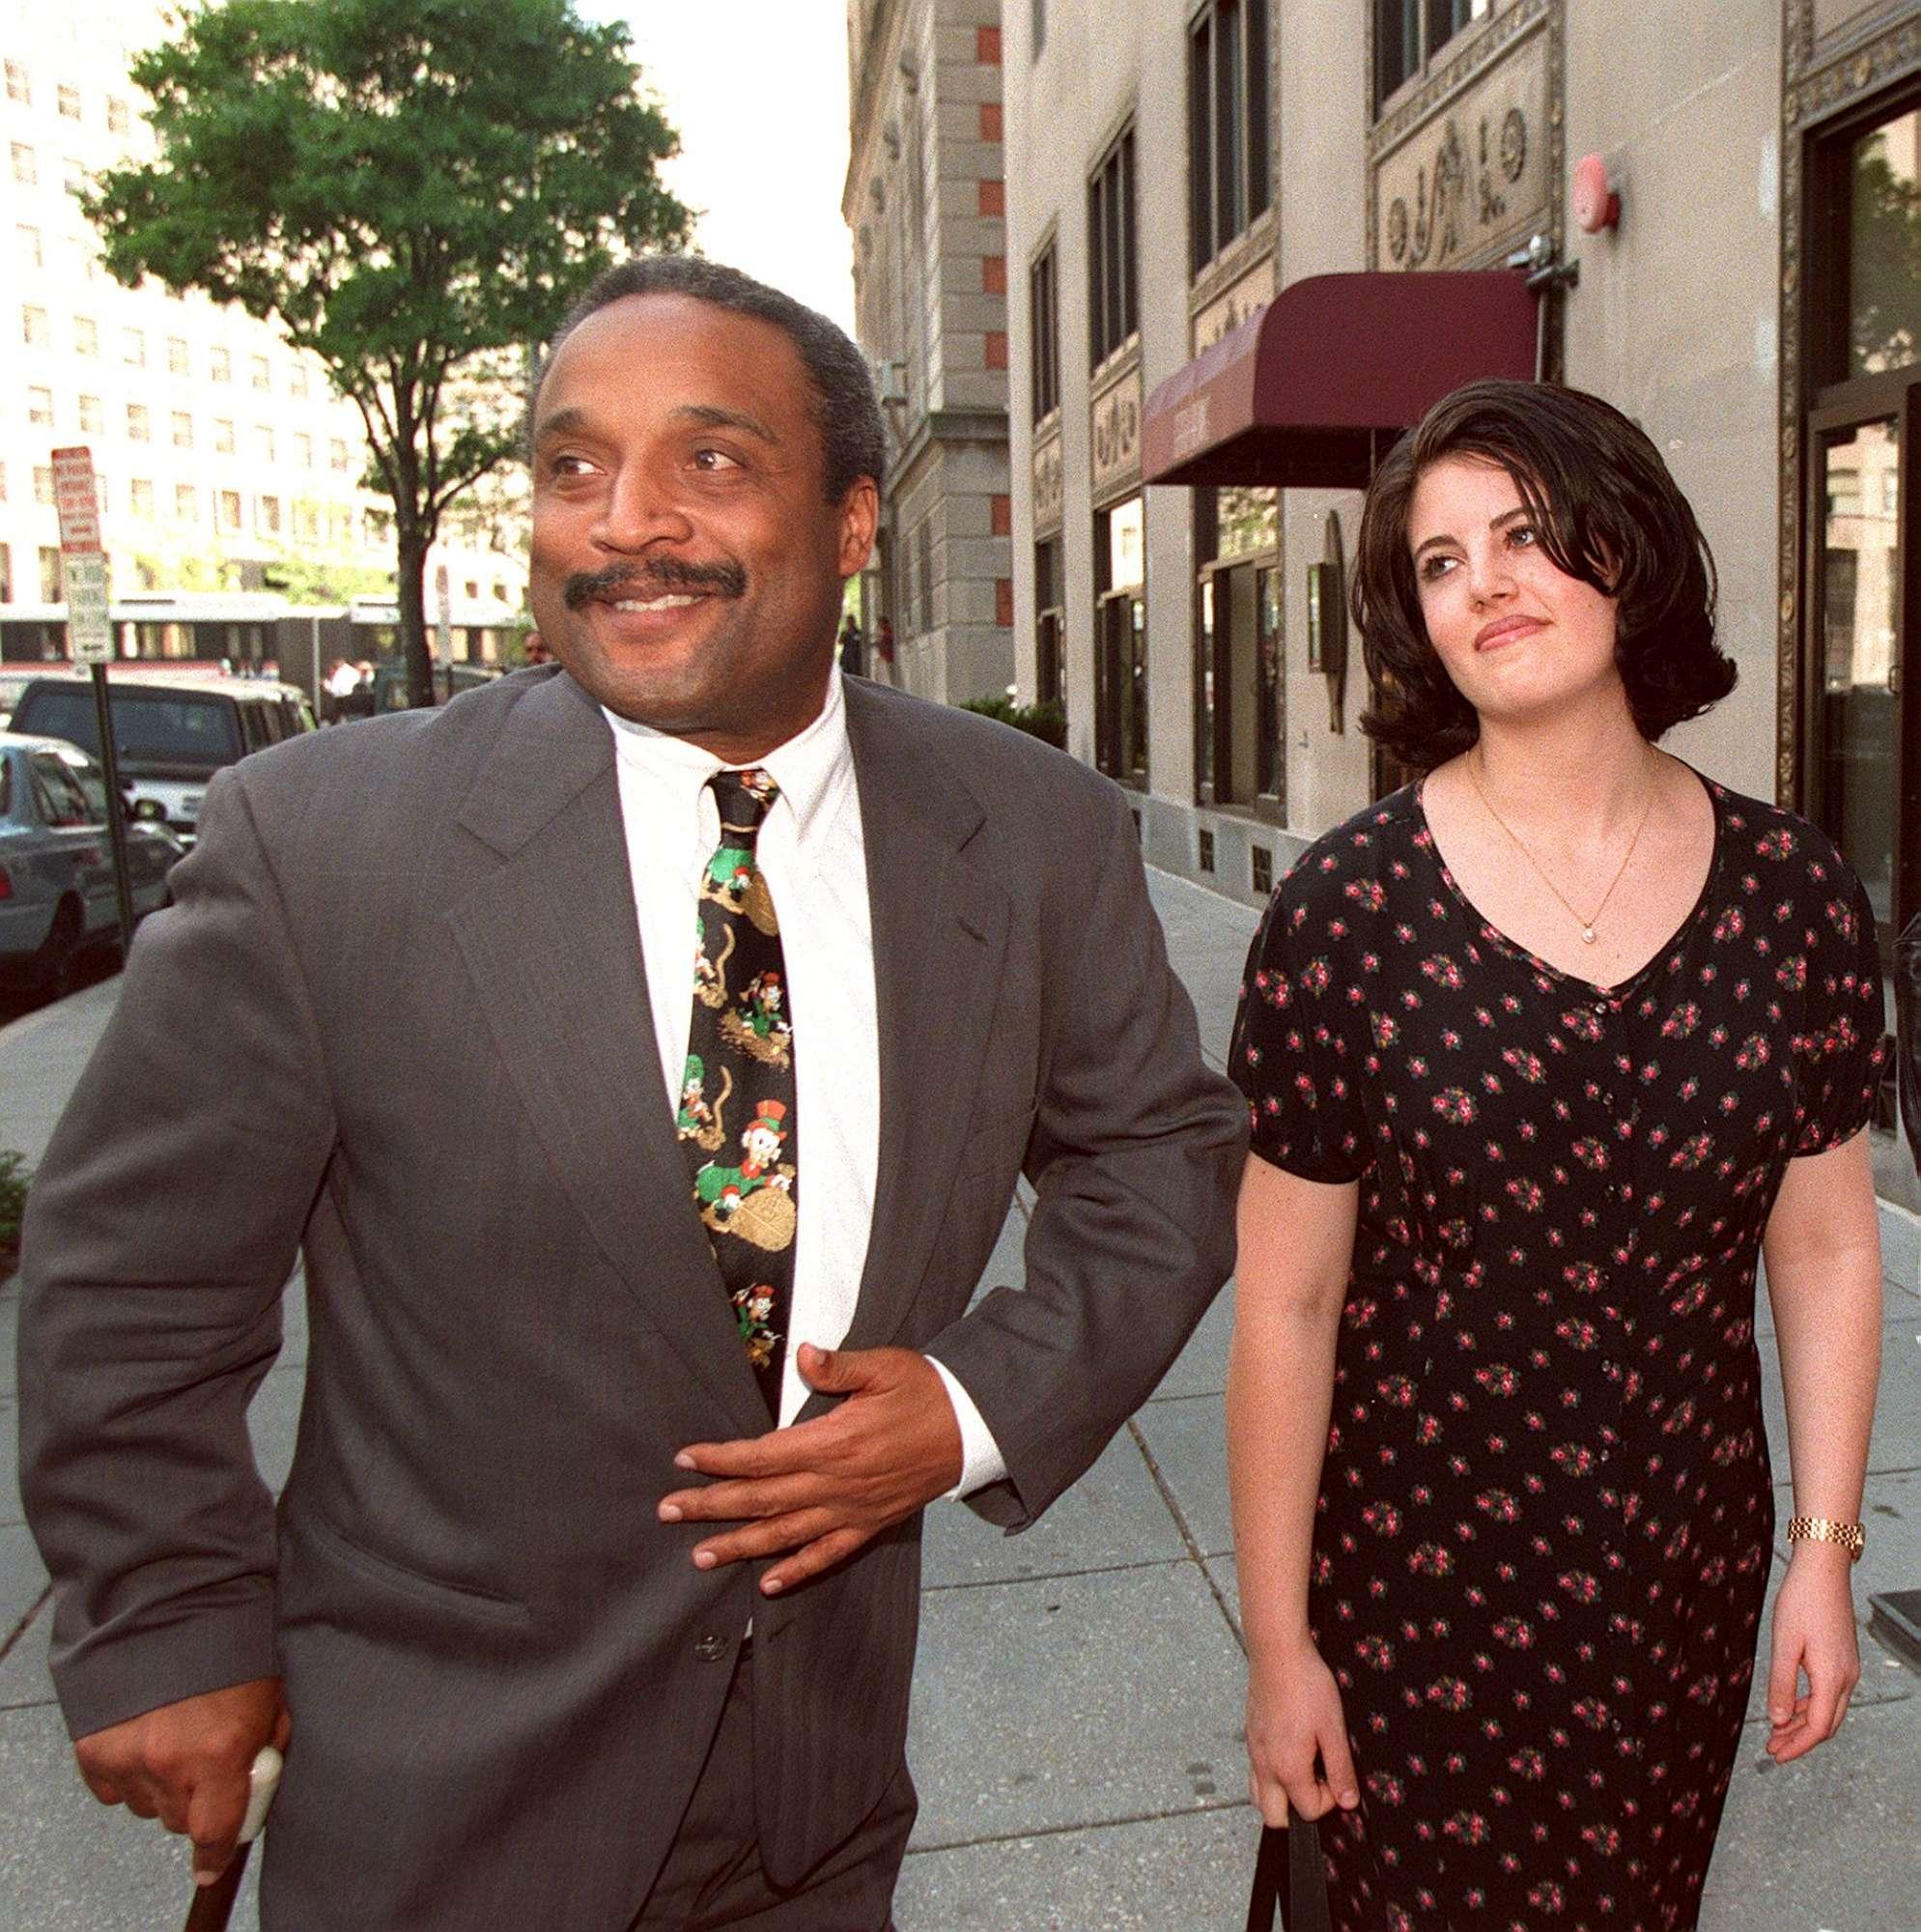 Monica Lewinsky, dallo scandalo Clinton a un reality da... Celebrity